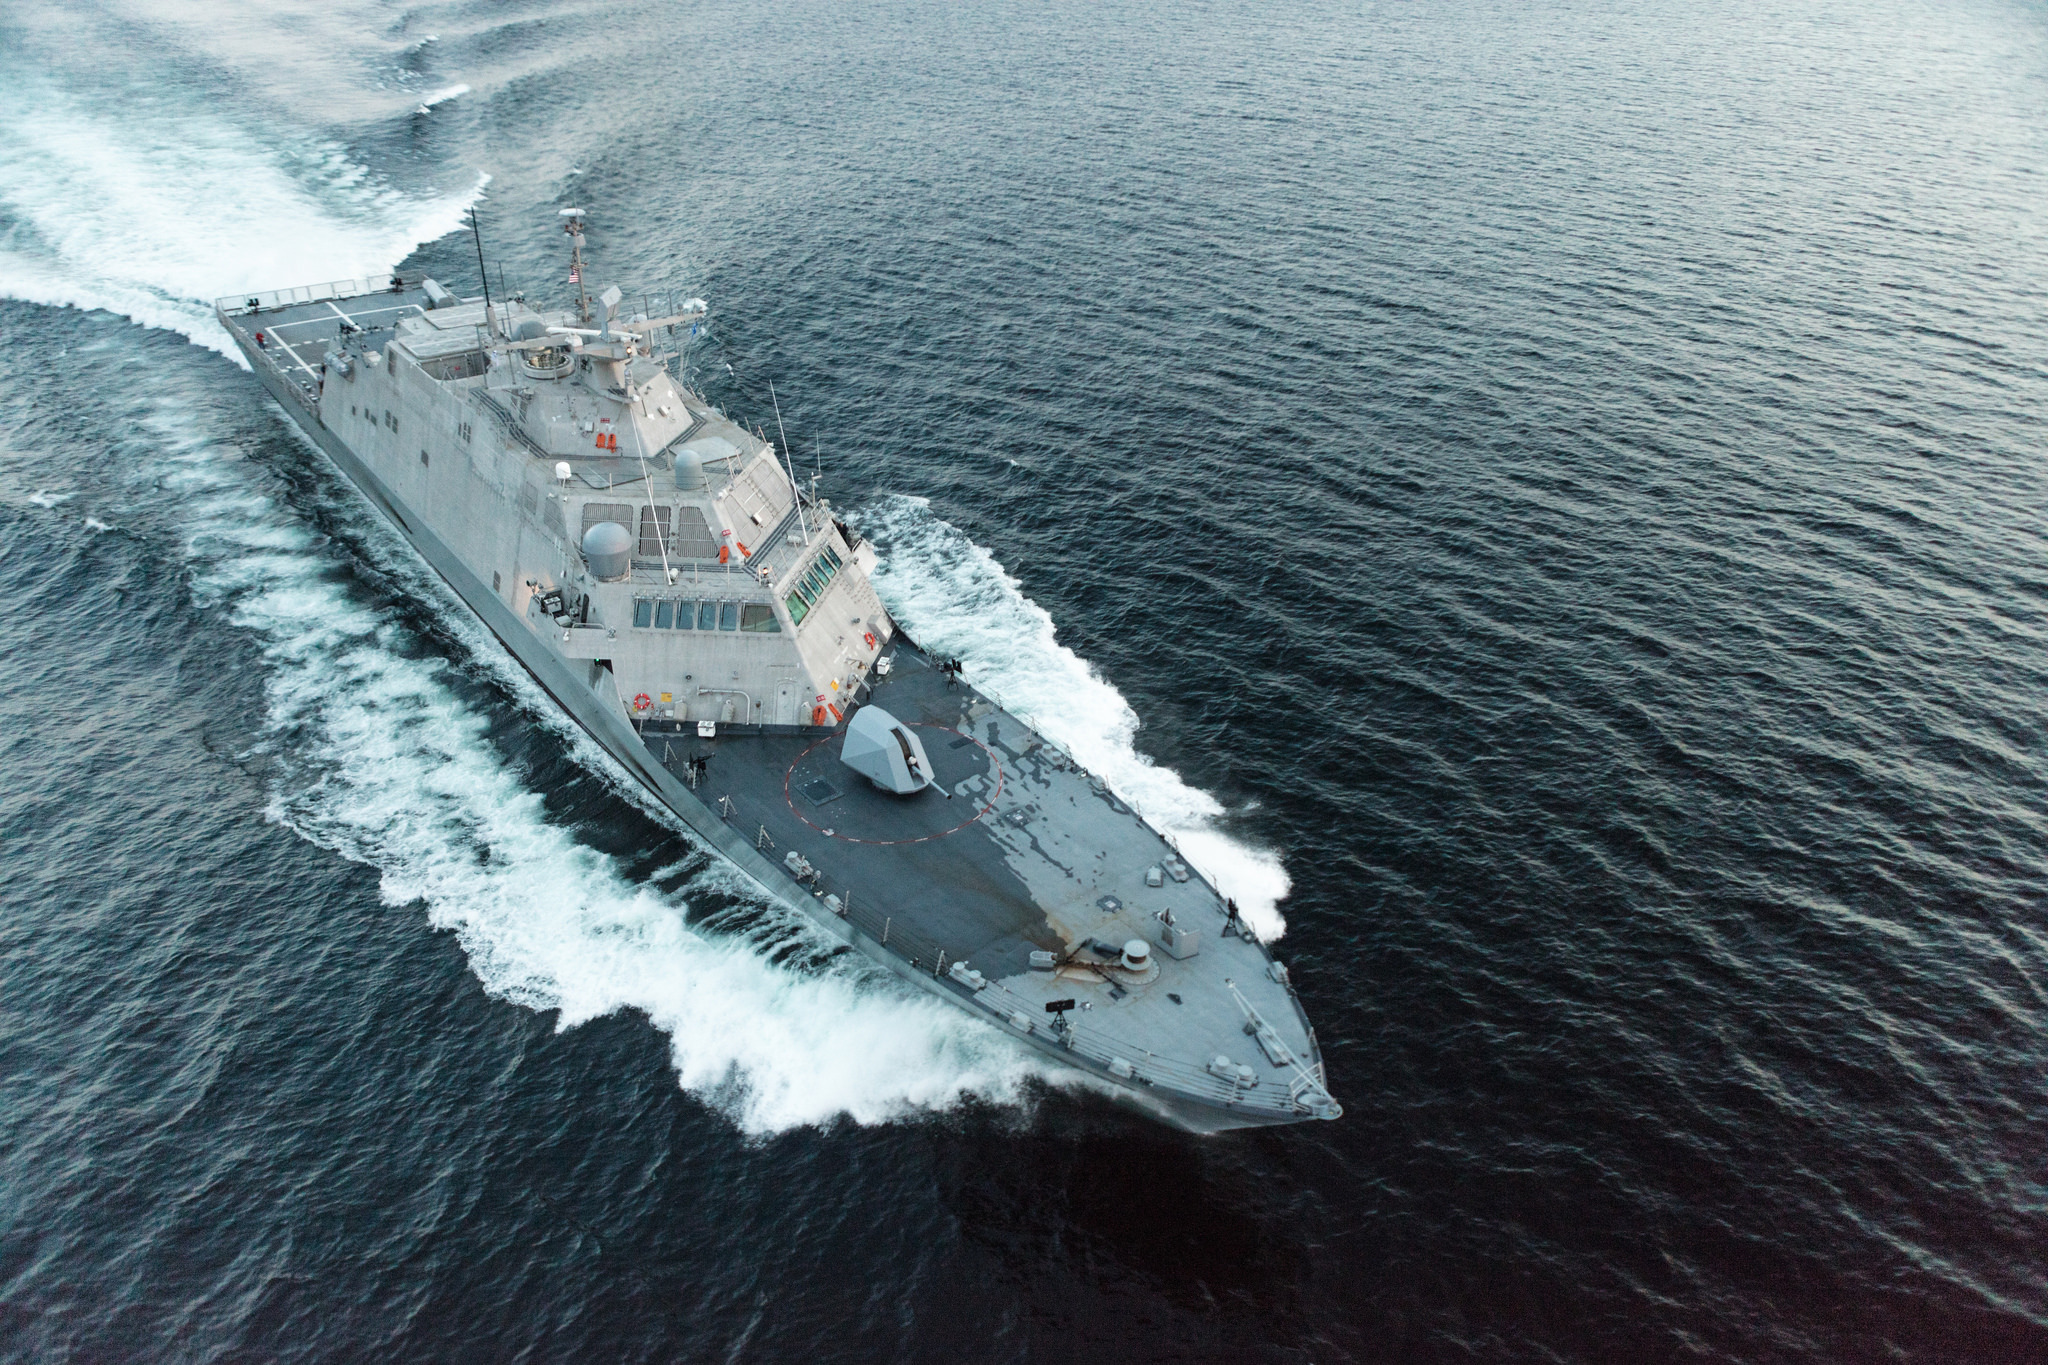 Combat Ship USS Little Rock, Combat, Navy, Ship, USN, HQ Photo